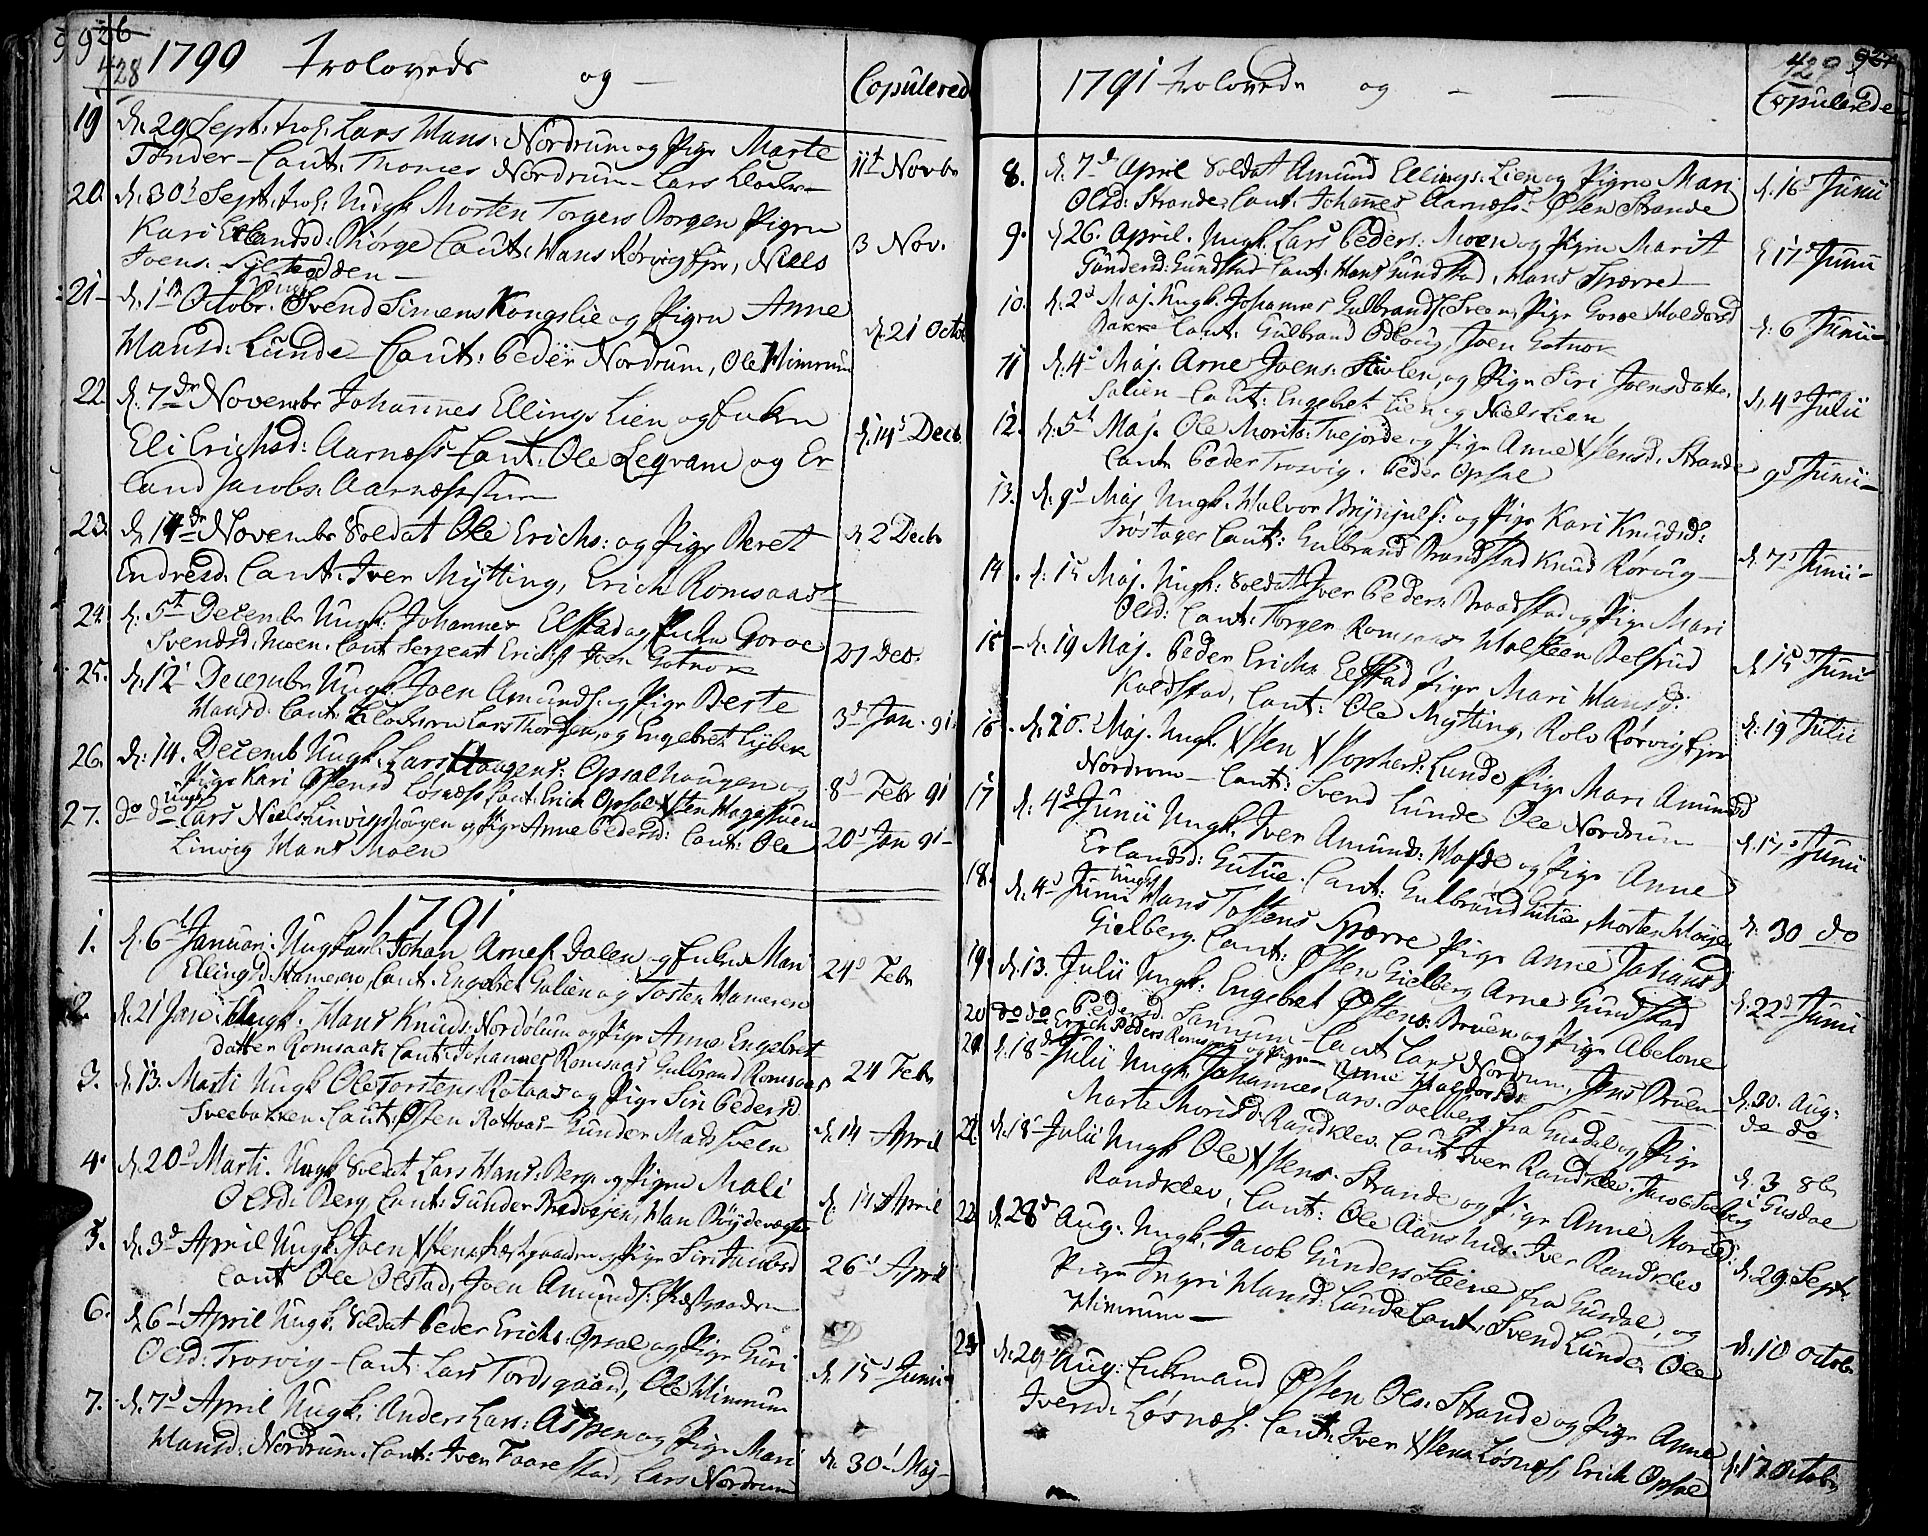 SAH, Ringebu prestekontor, Ministerialbok nr. 3, 1781-1820, s. 428-429